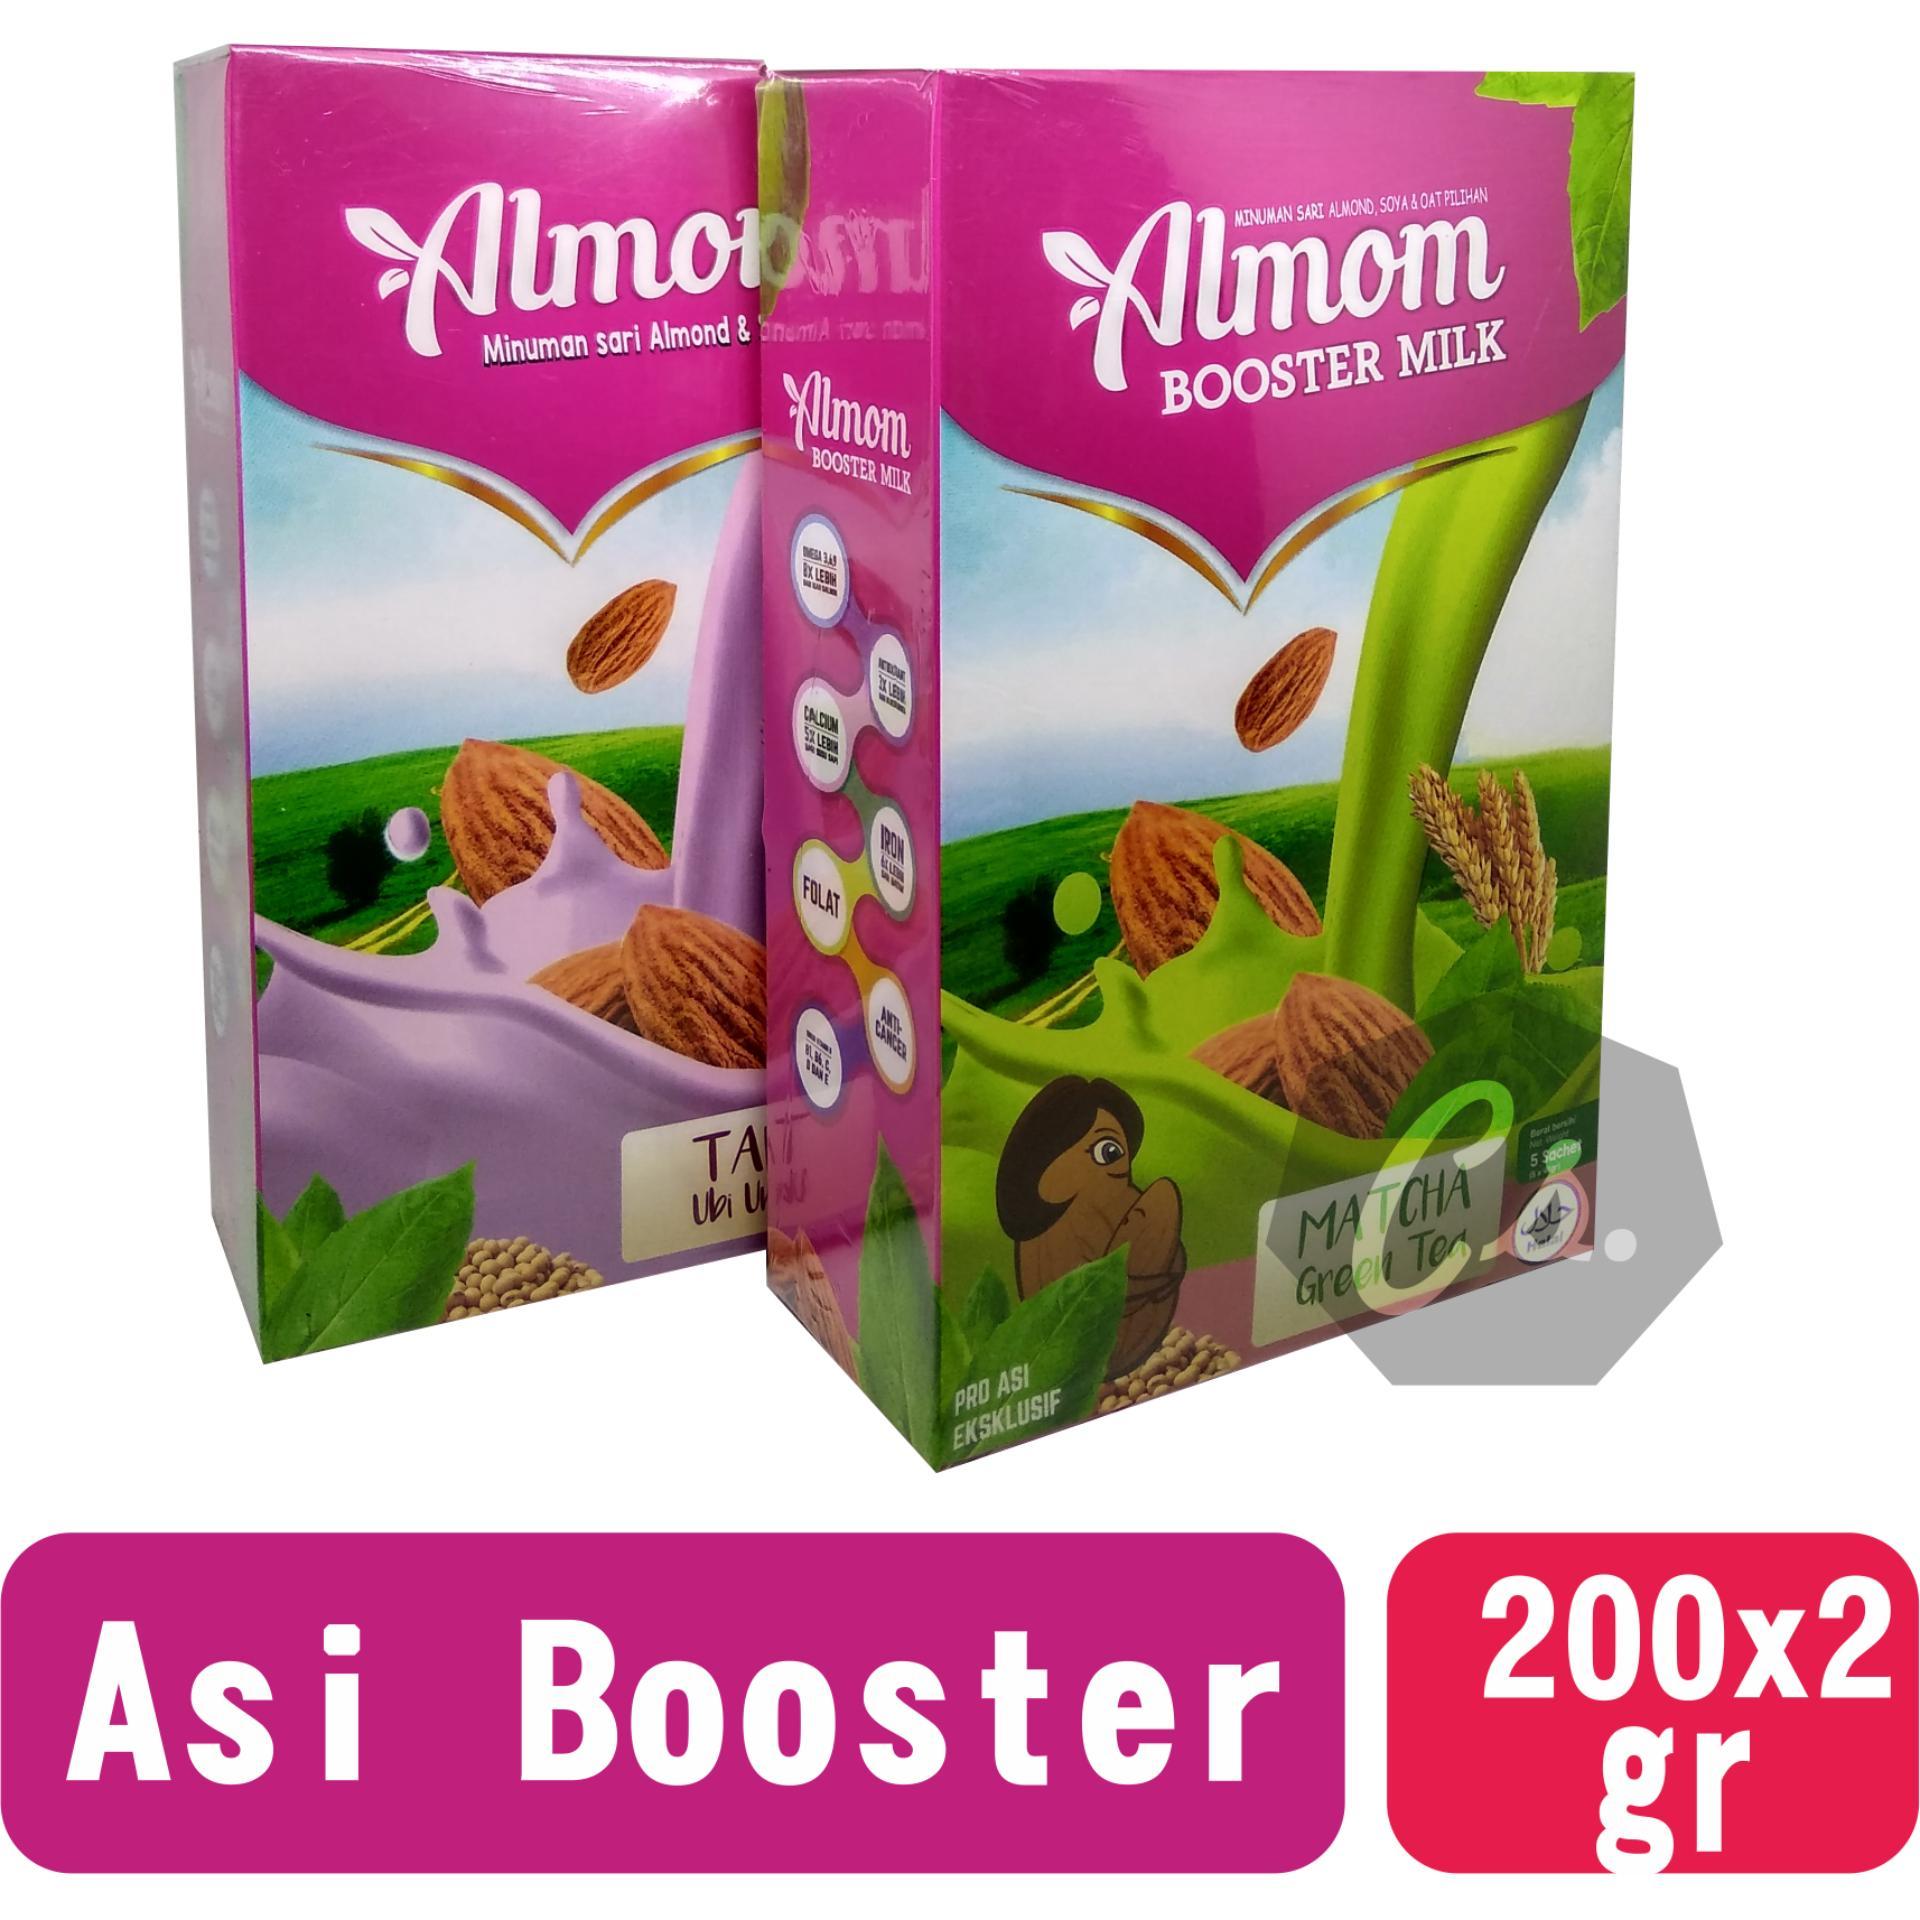 2 box Almom Asi Booster / Susu Almond / Yummy's Almond Milk Powder